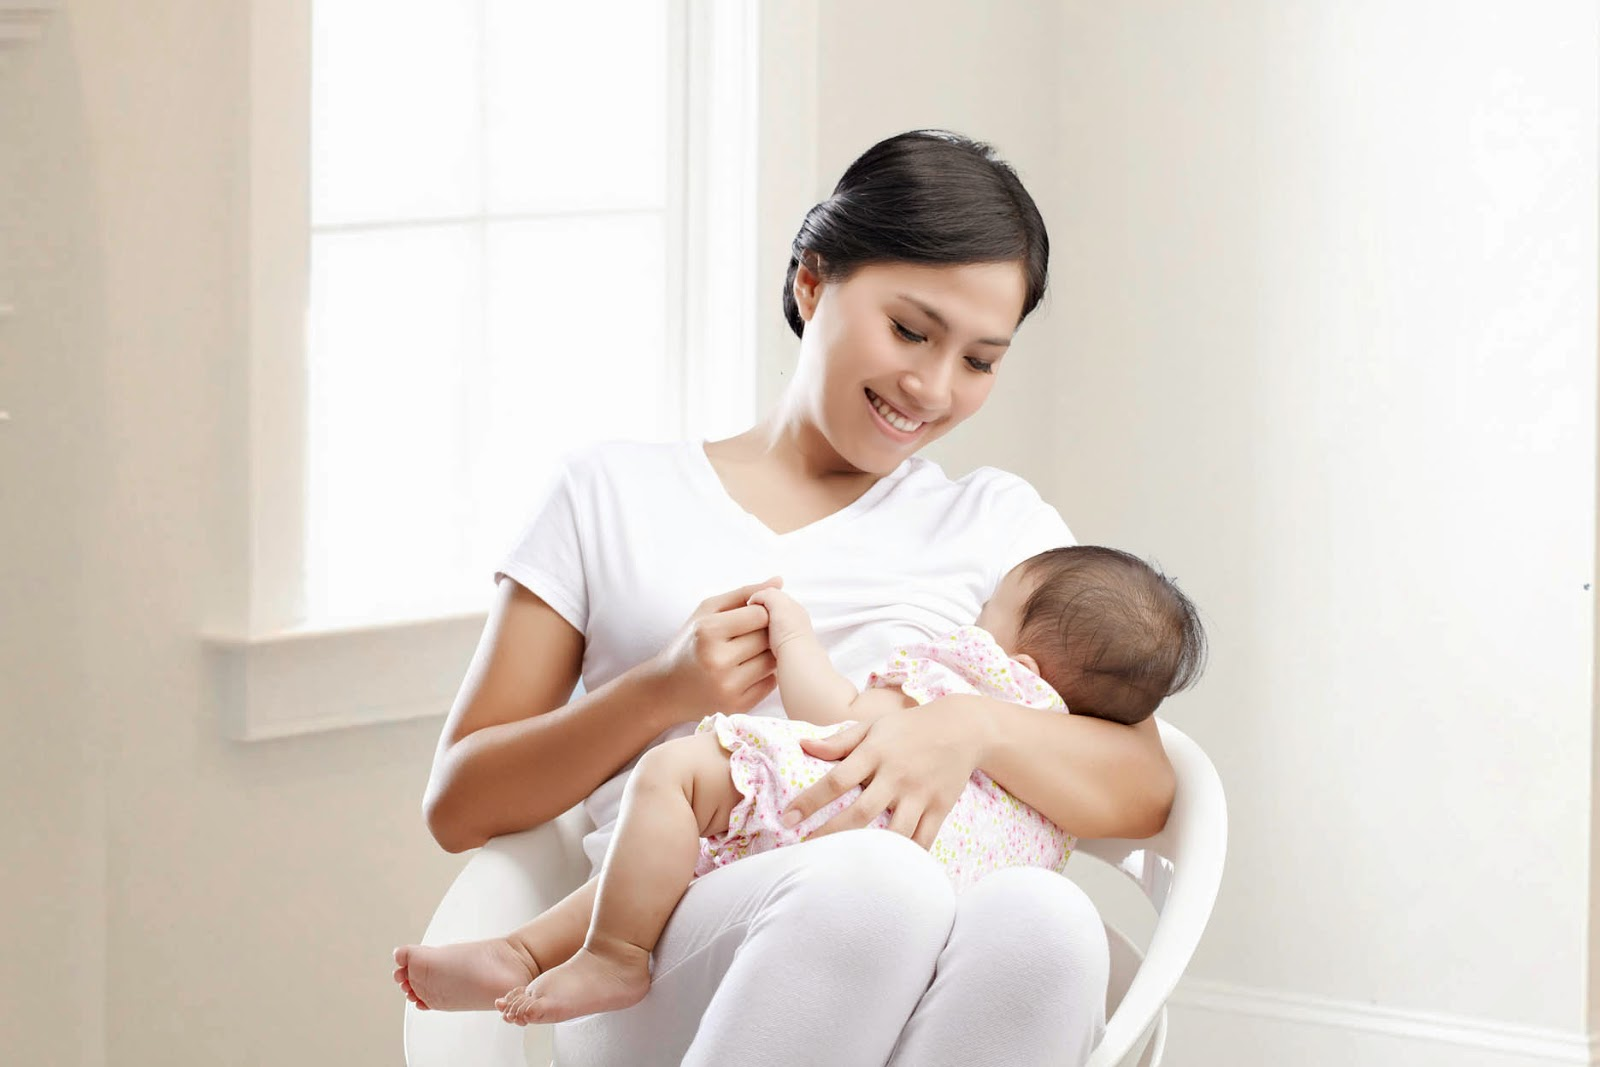 Tanda bayi cukup susu ibu